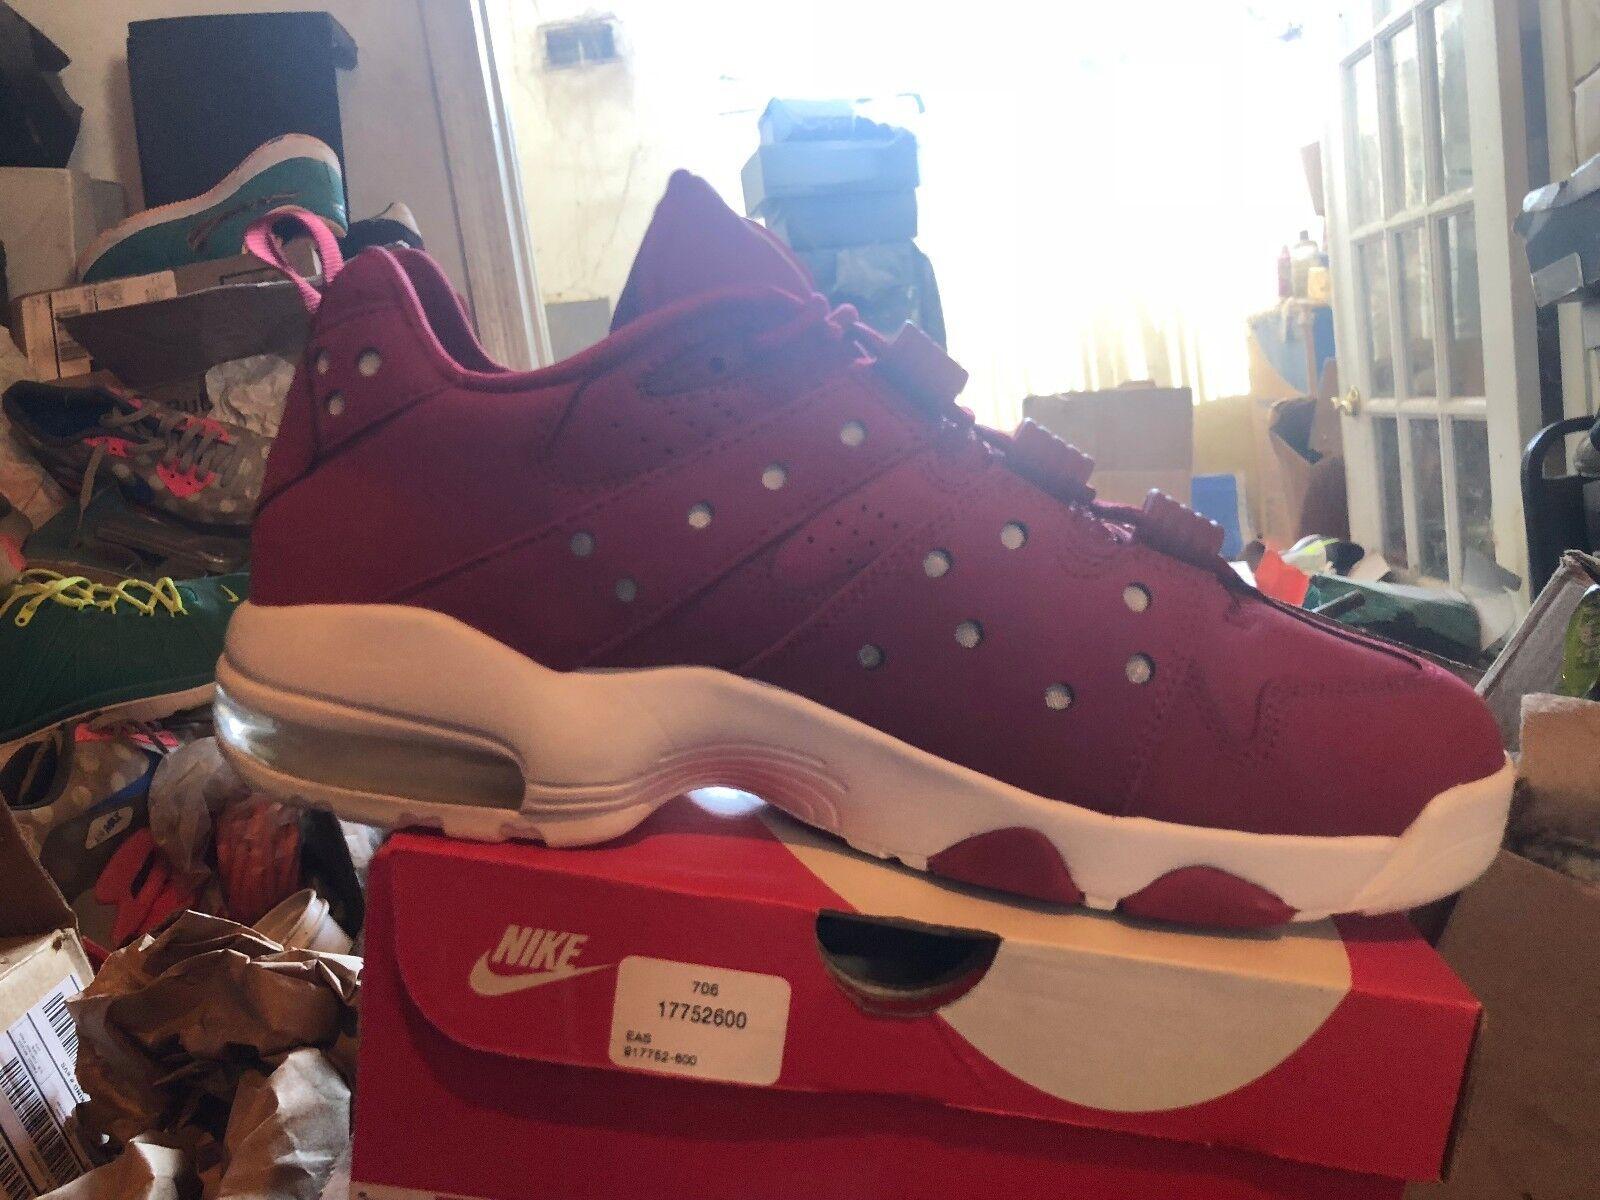 Nike air max - - 94 gering bnib rot - - rot / weißen größe 11,5 917752 600 e1fd26